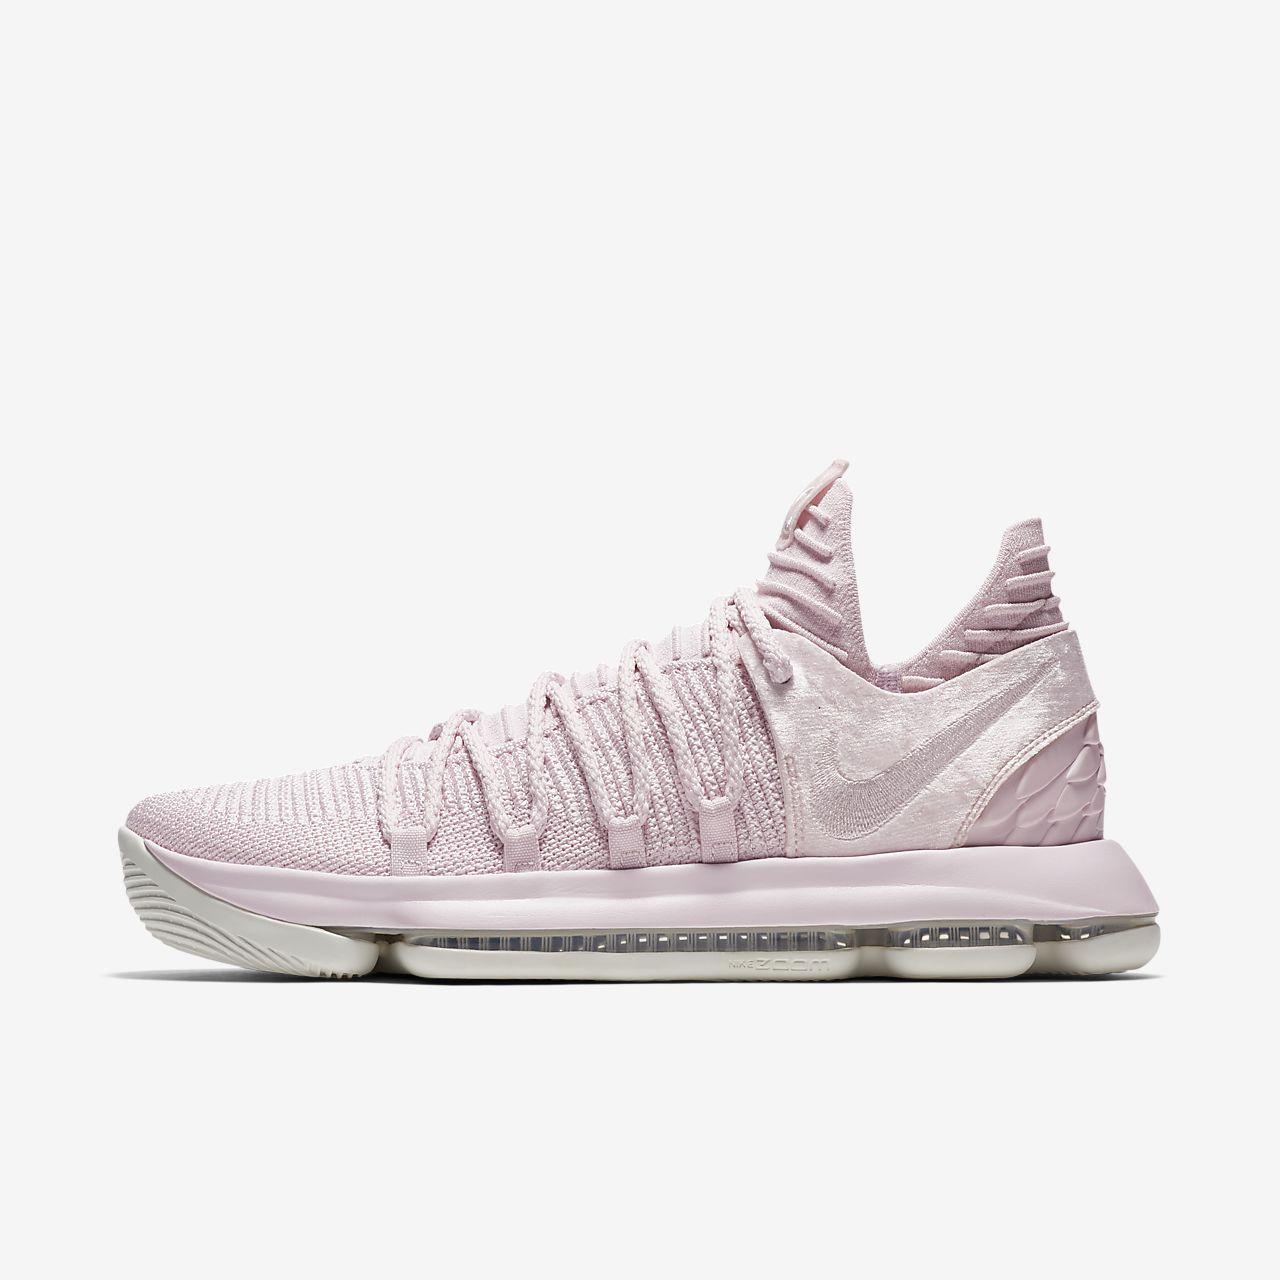 Nike Zoom KD10 AP EP 男子篮球鞋